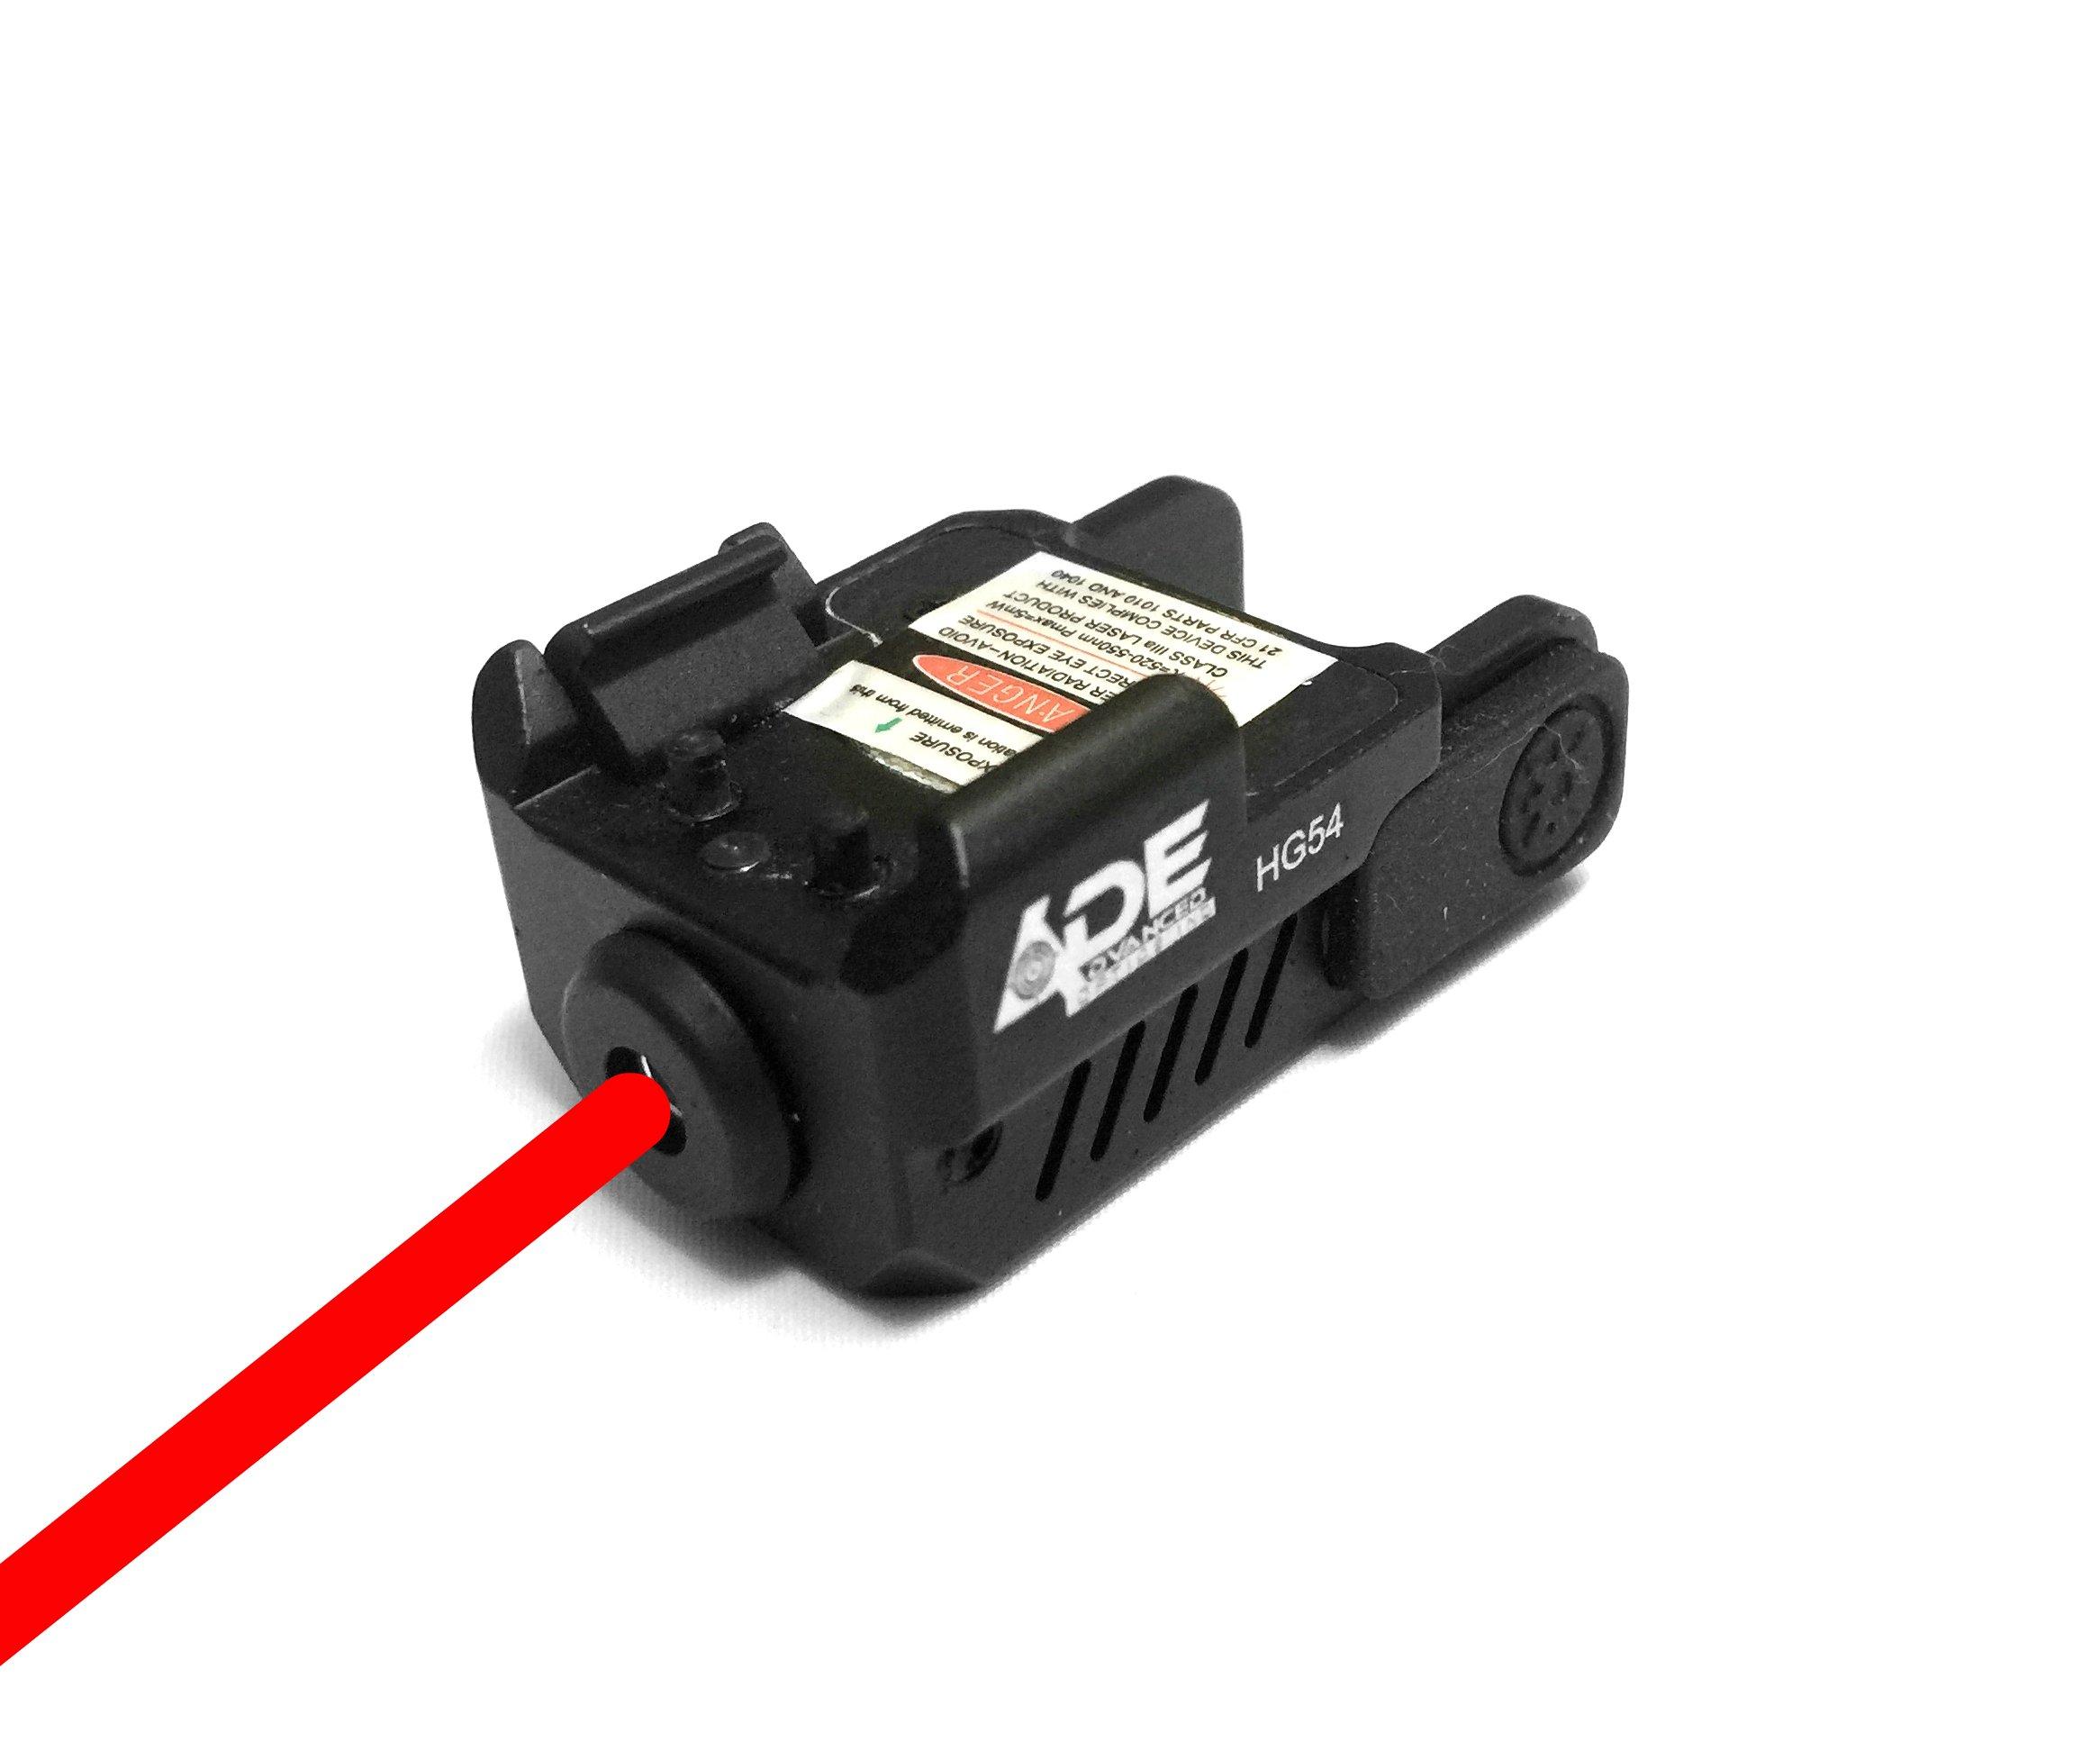 Ade Advanced Optics HG54R-1 Universal Laser Sight, Red by Ade Advanced Optics